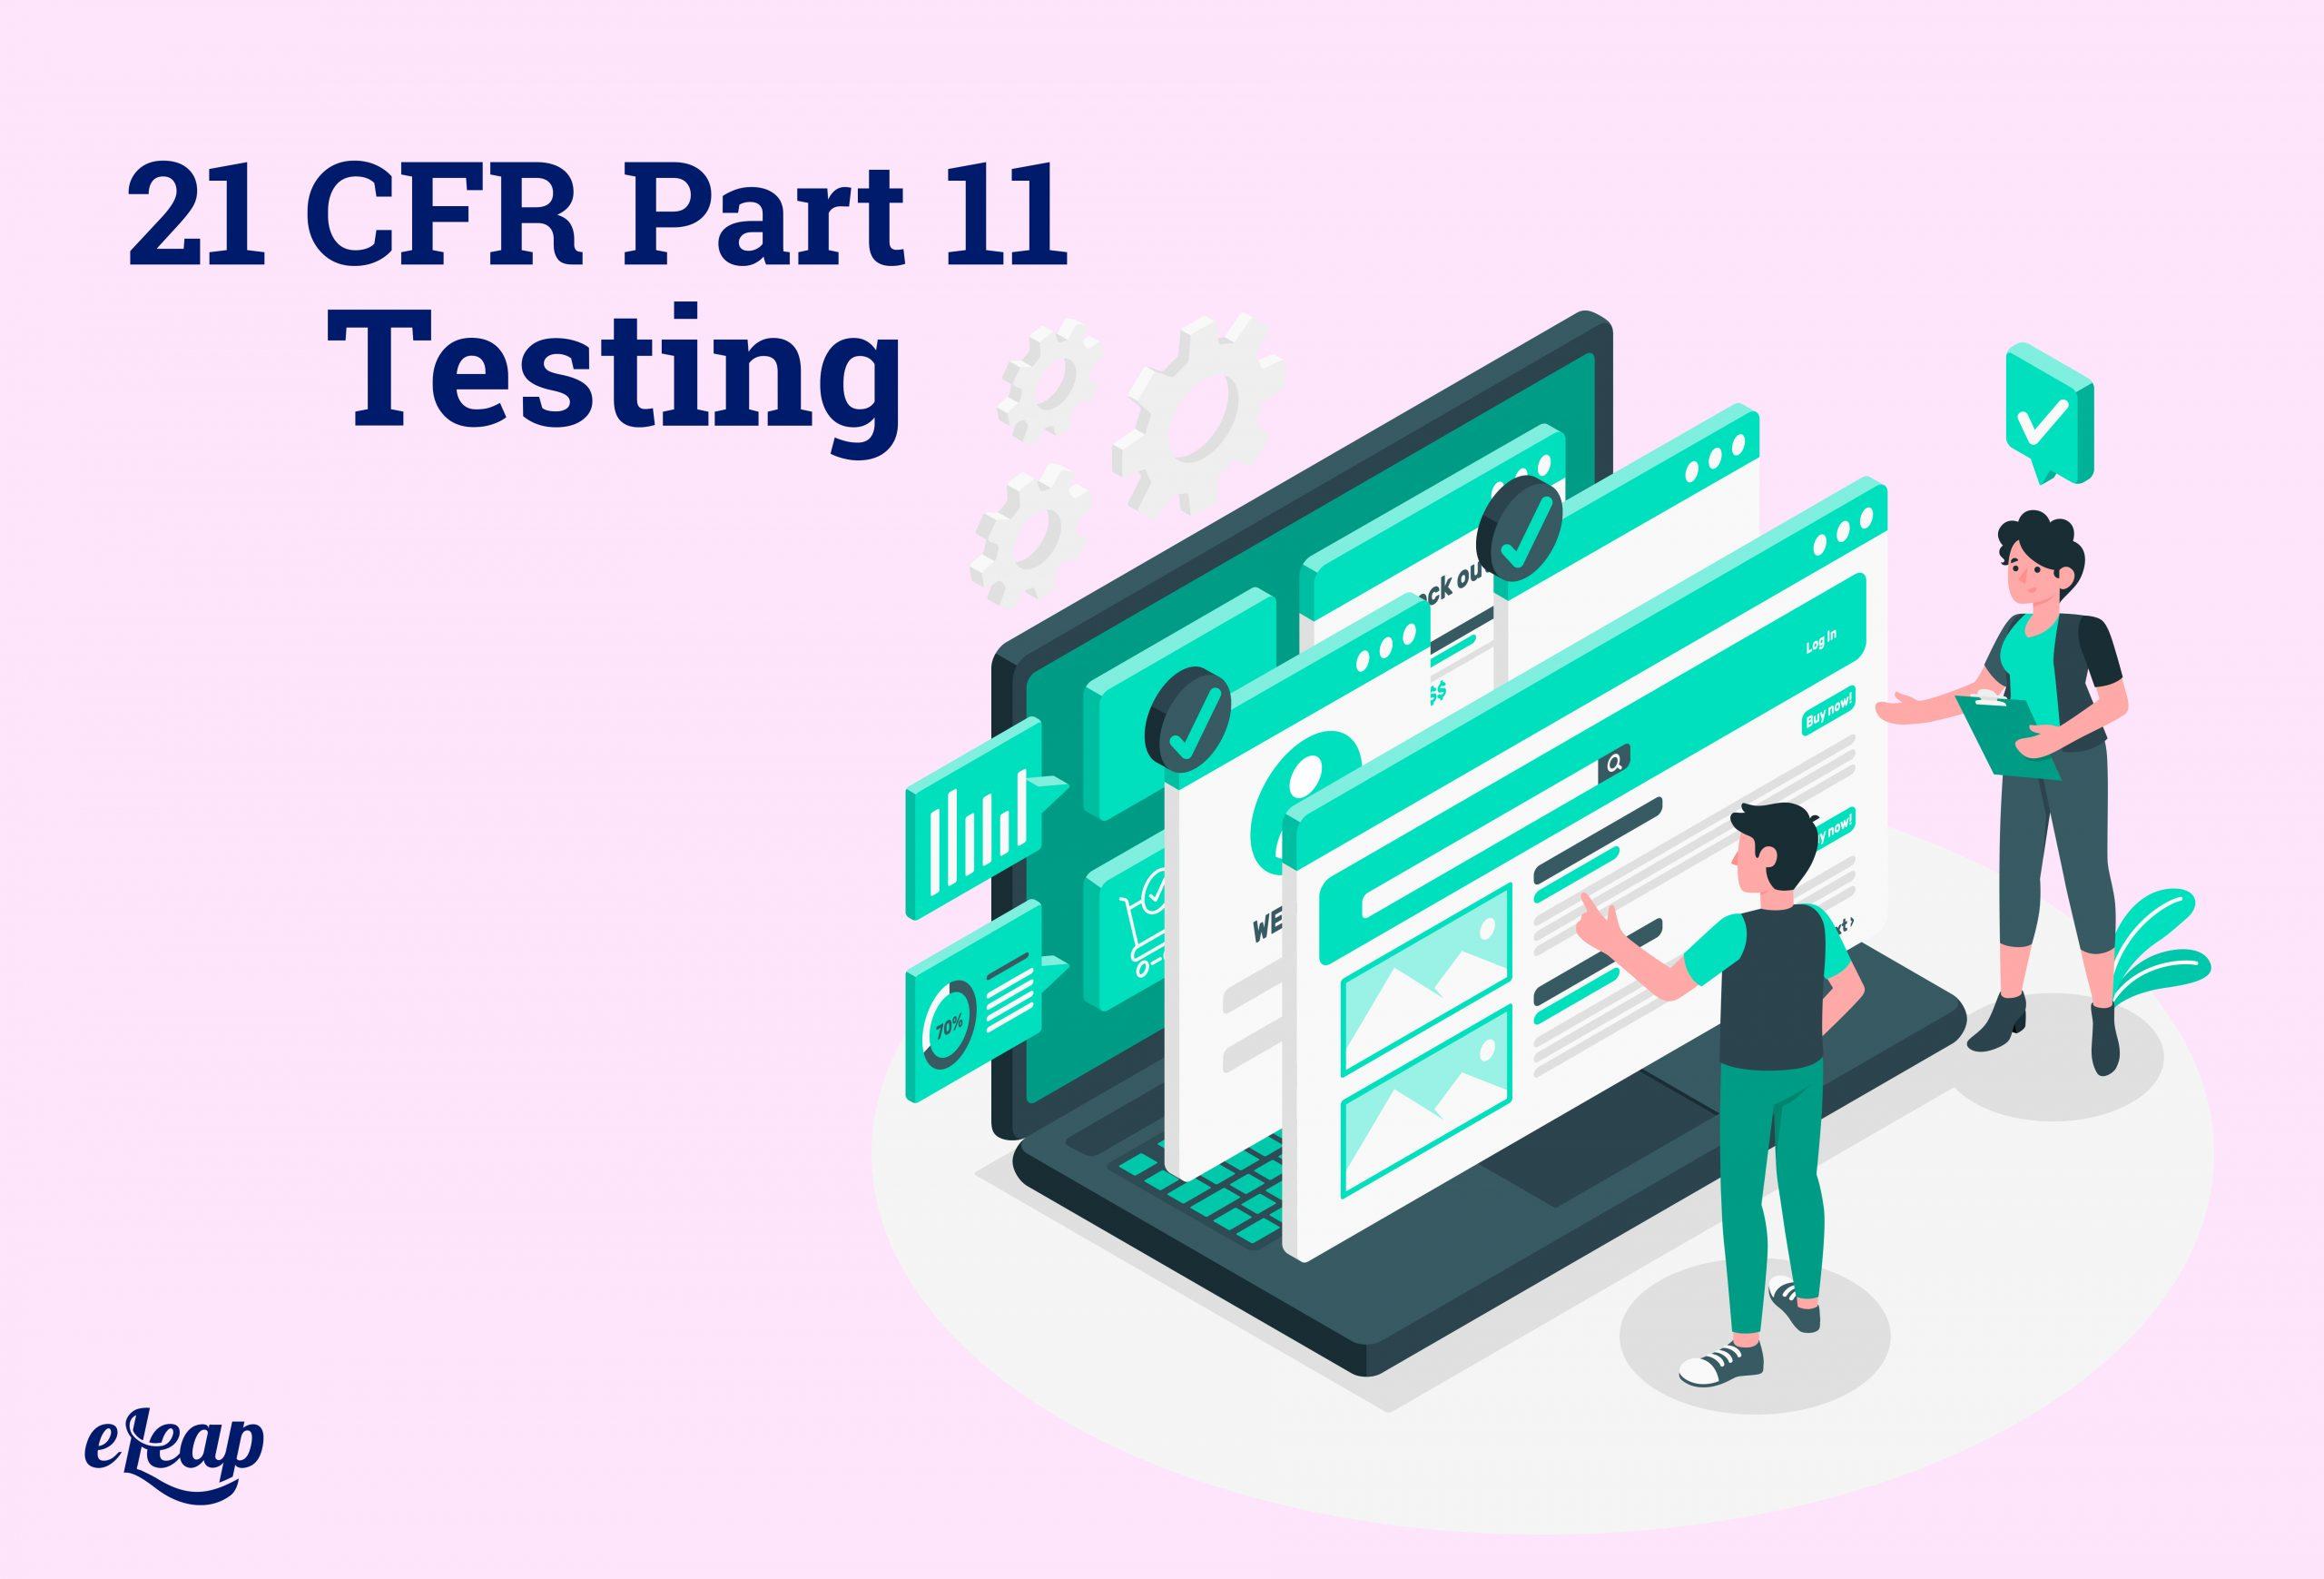 CFR Part 11 Testing